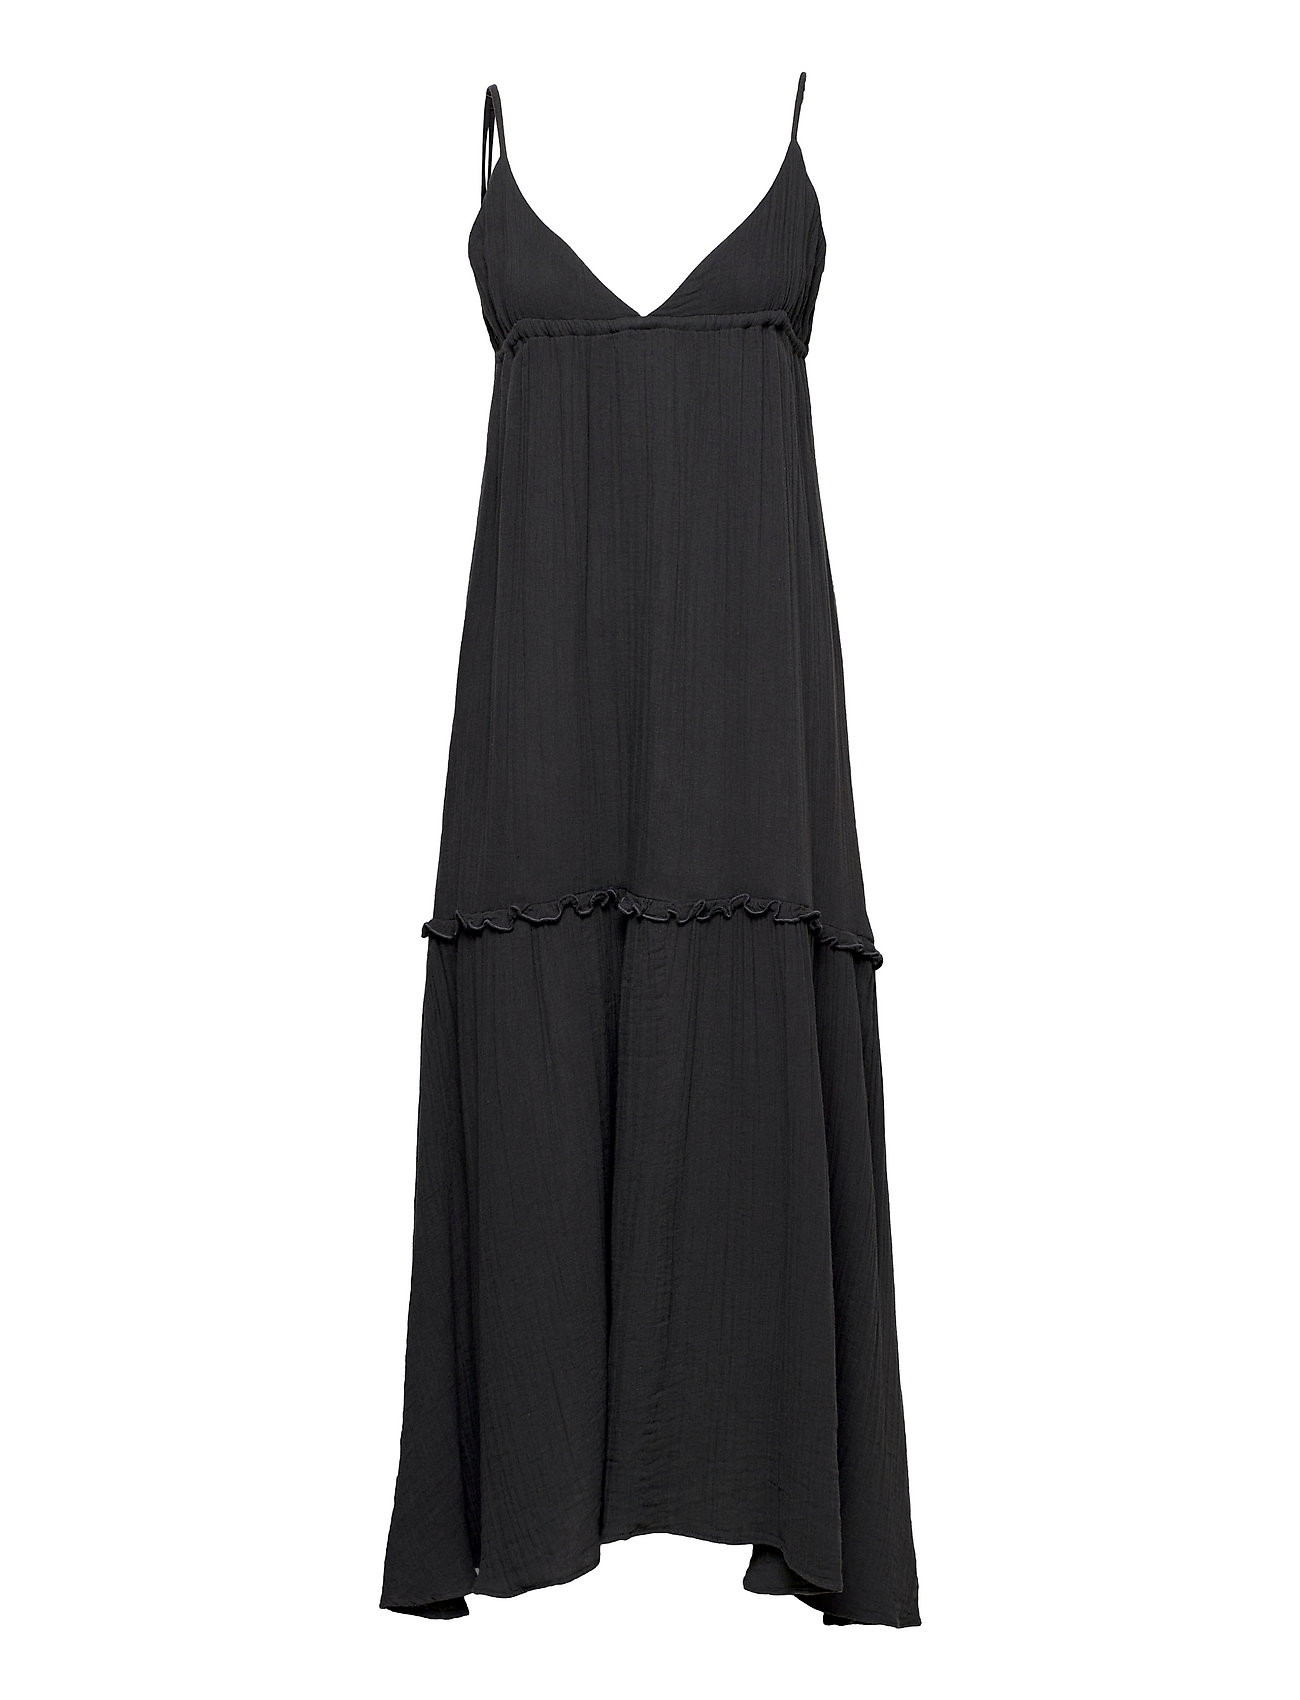 Mitzi Dress Maxikjole Festkjole Sort Twist & Tango